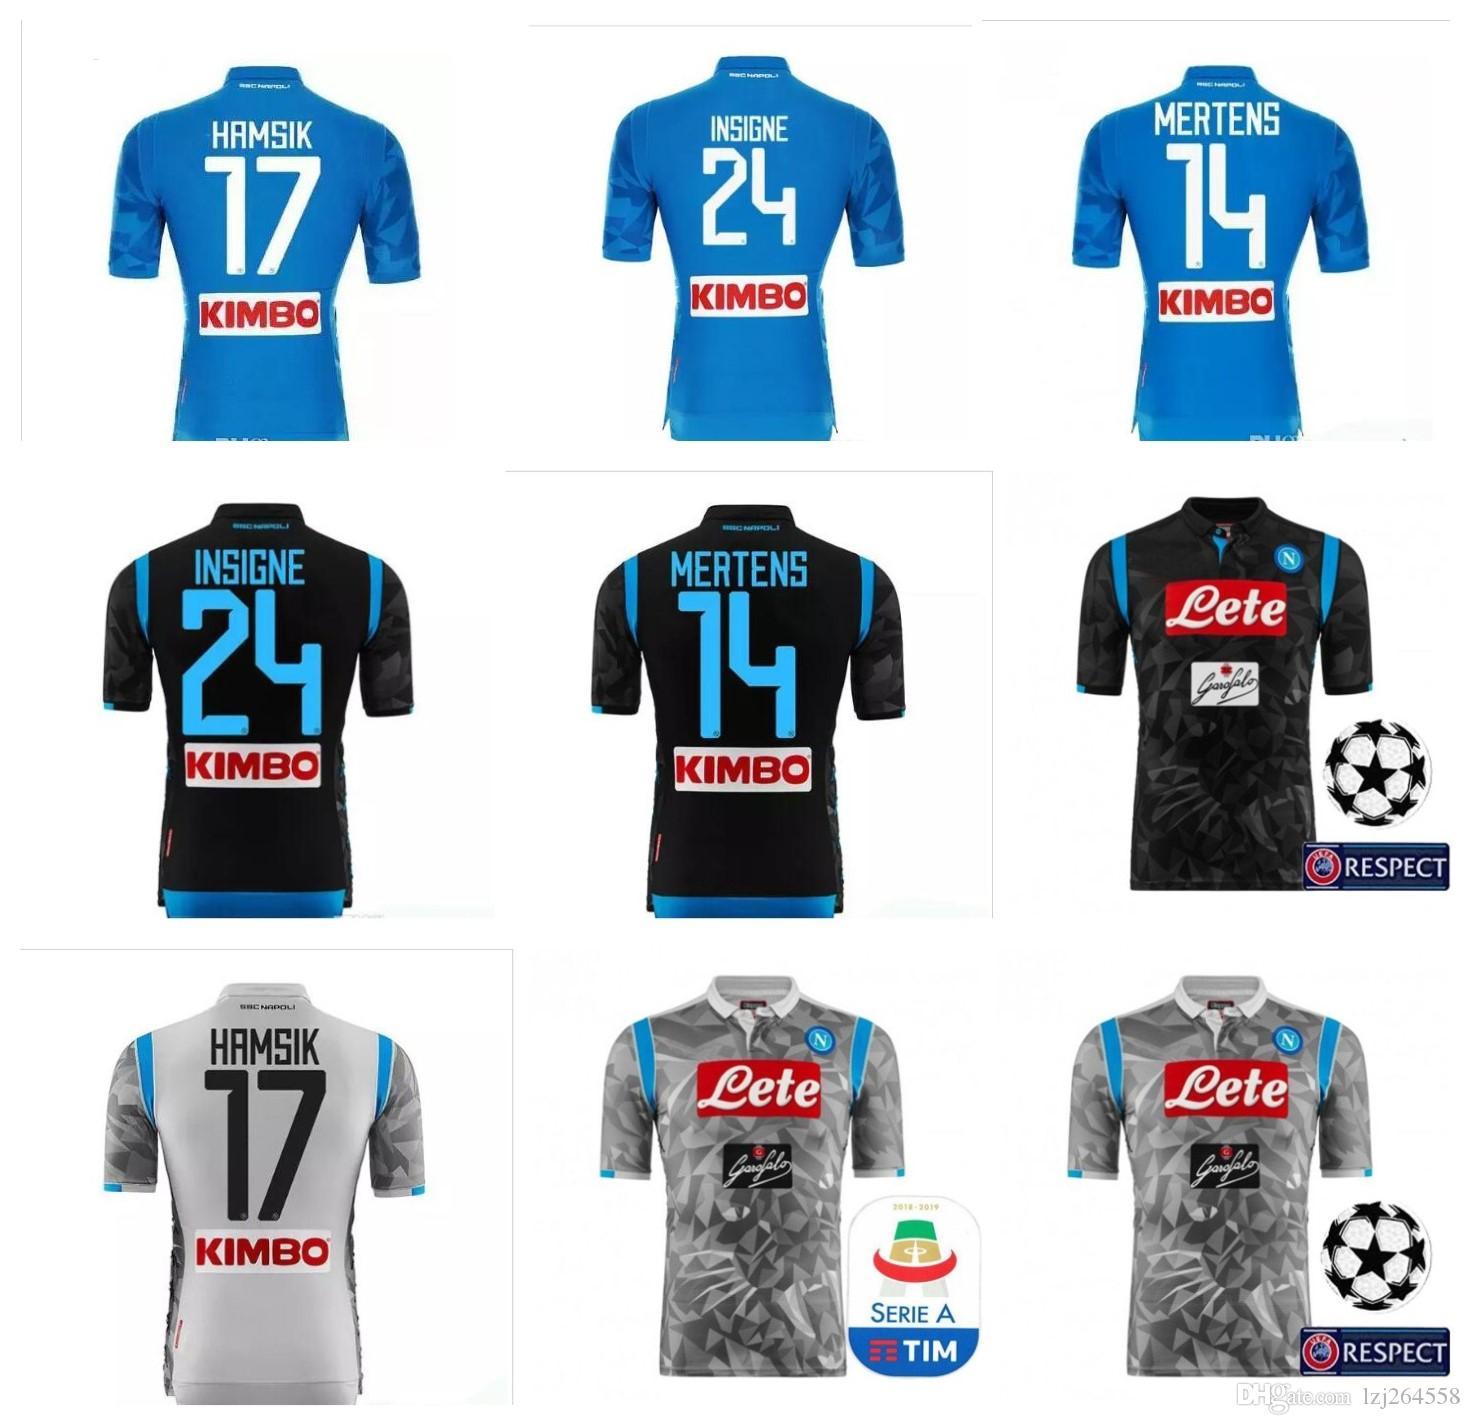 Nueva Camiseta Napoli Jersey 2018 De Fútbol Camiseta De Fútbol Hamsik  Maradona Uniforme Callejon Mertens Insigne Descuento 18 19 TOP Thai Naples  2019 Por ... 80cce1959a507